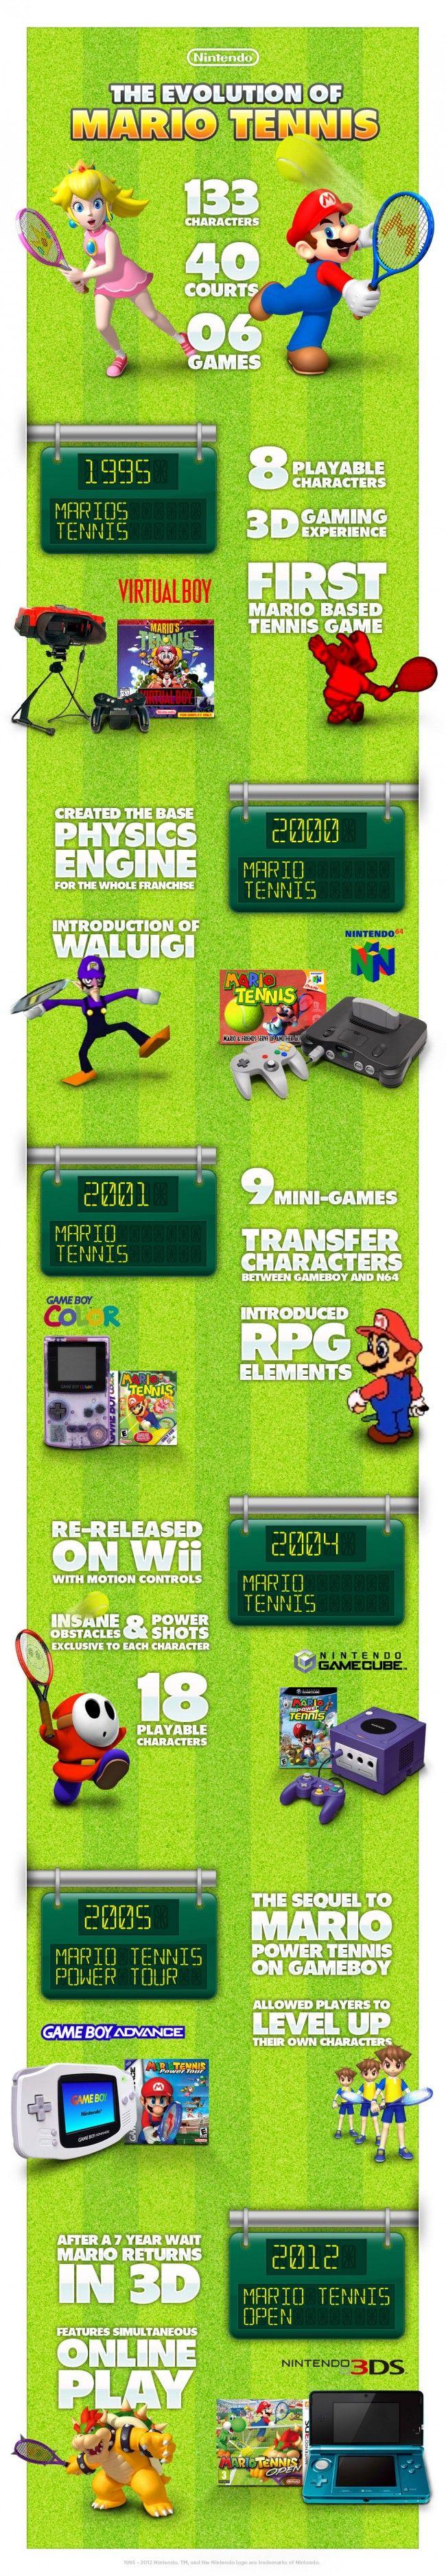 Nintendo Serves Up Mario Tennis History Infographic